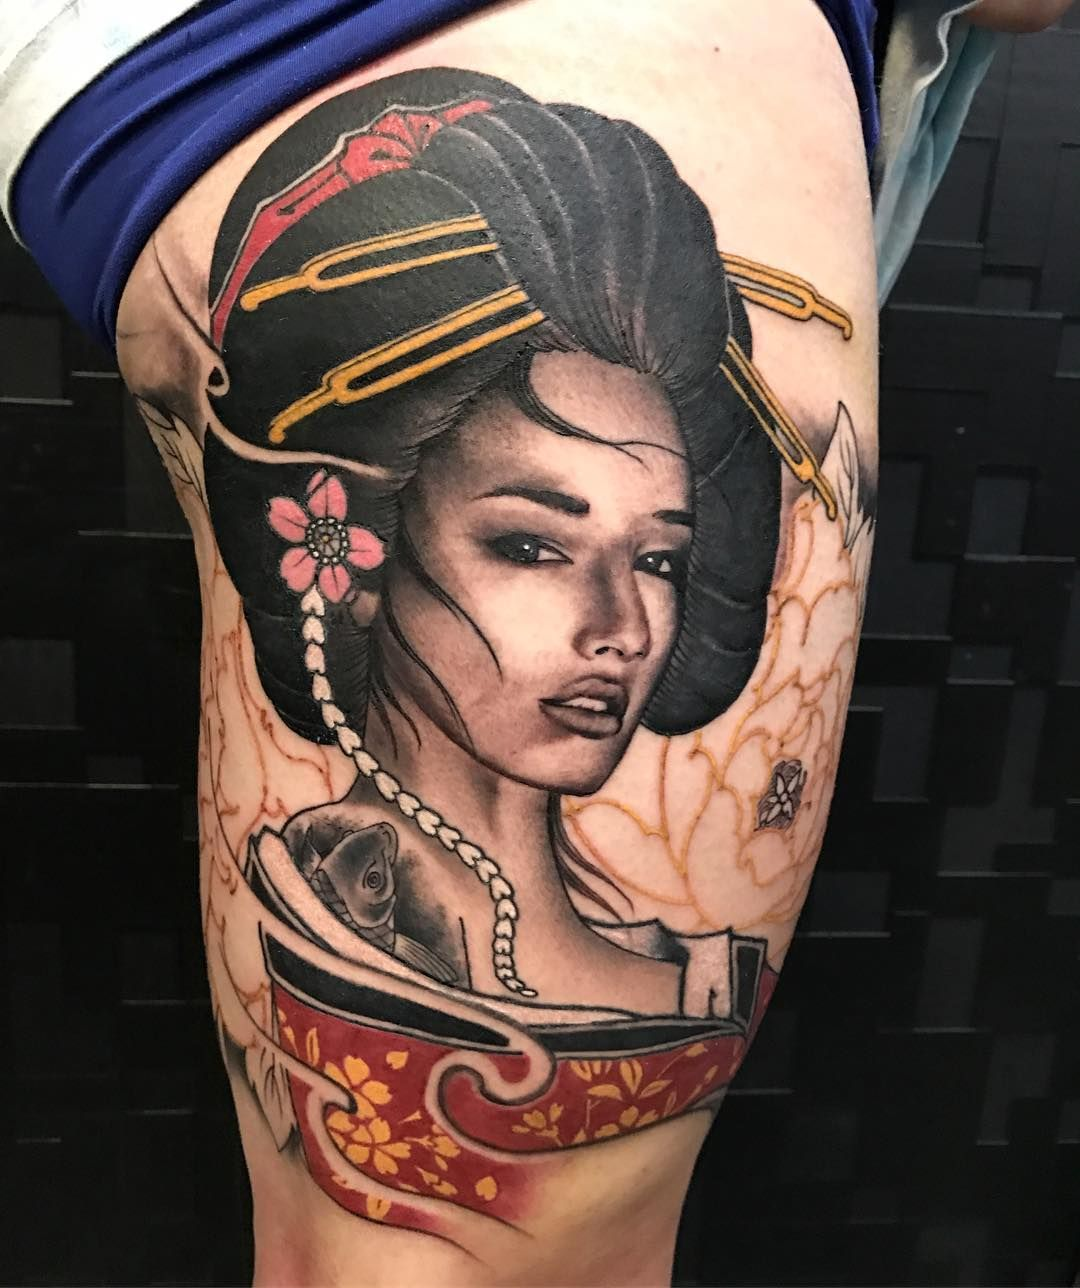 Geisha tattoo elegant geisha tattoo picture - Nice 55 Striking Geisha Tattoo Designs An Intelligent And Elegant Lady Check More At Http